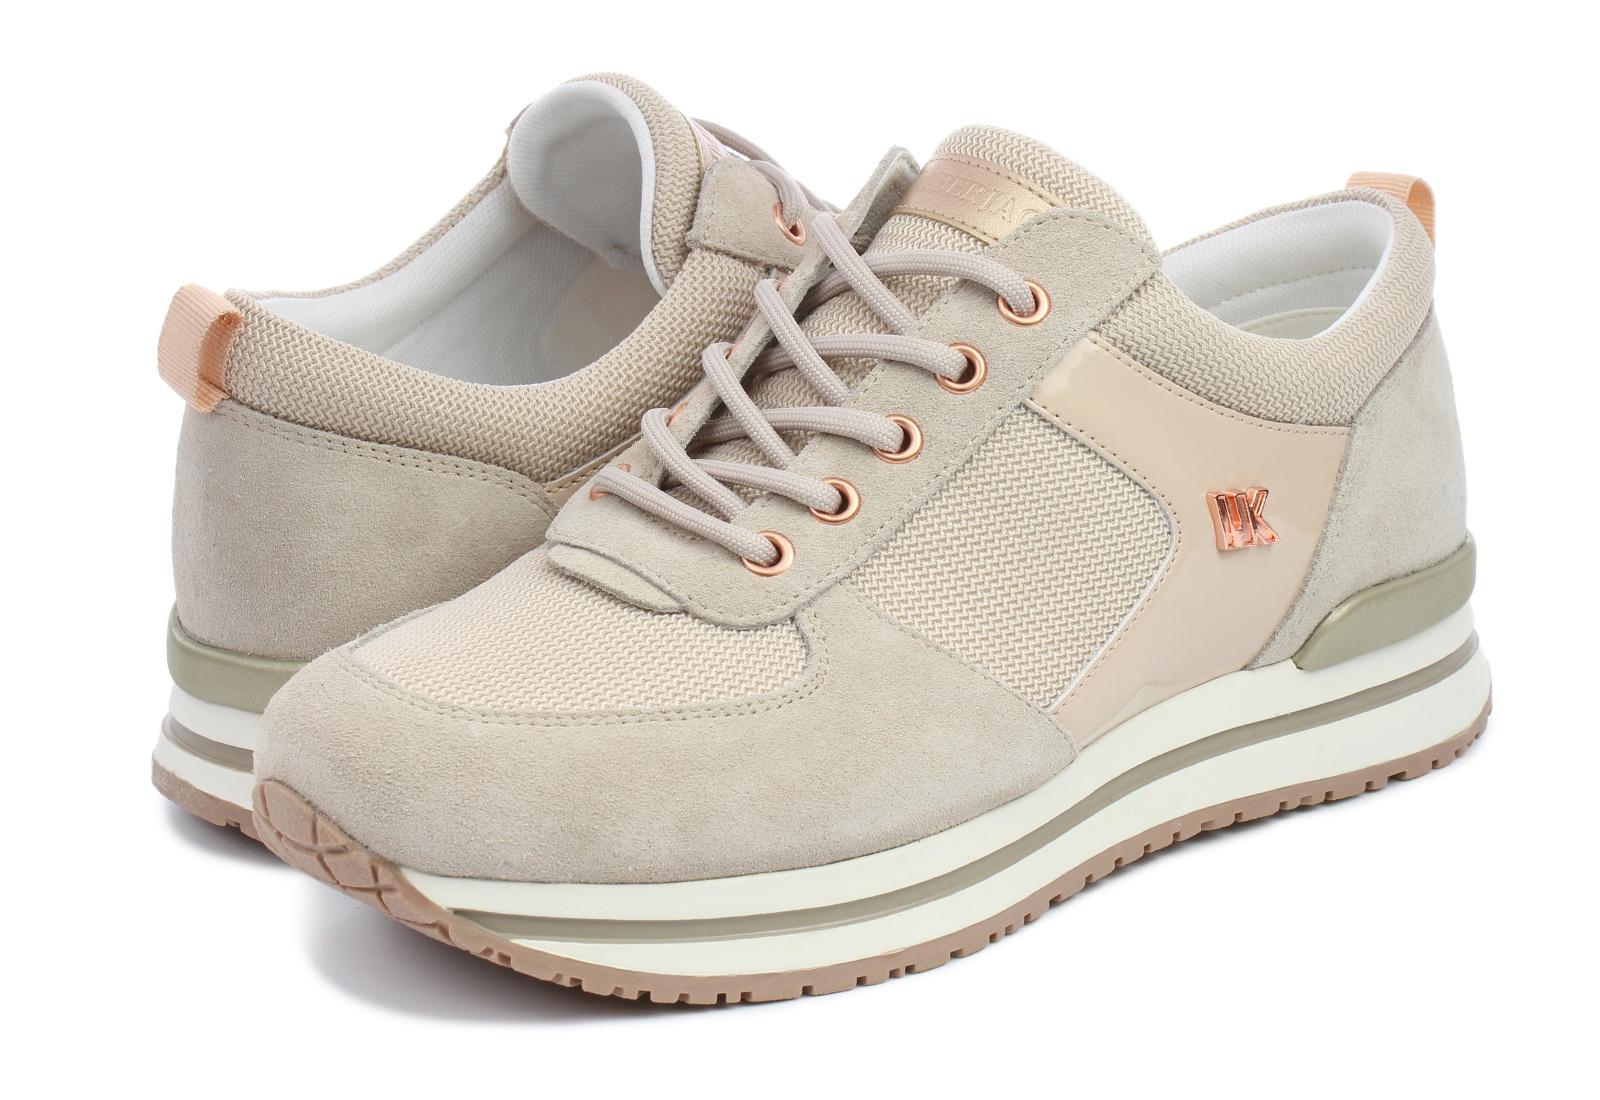 Viking Outdoor Footwear | Official Online Store